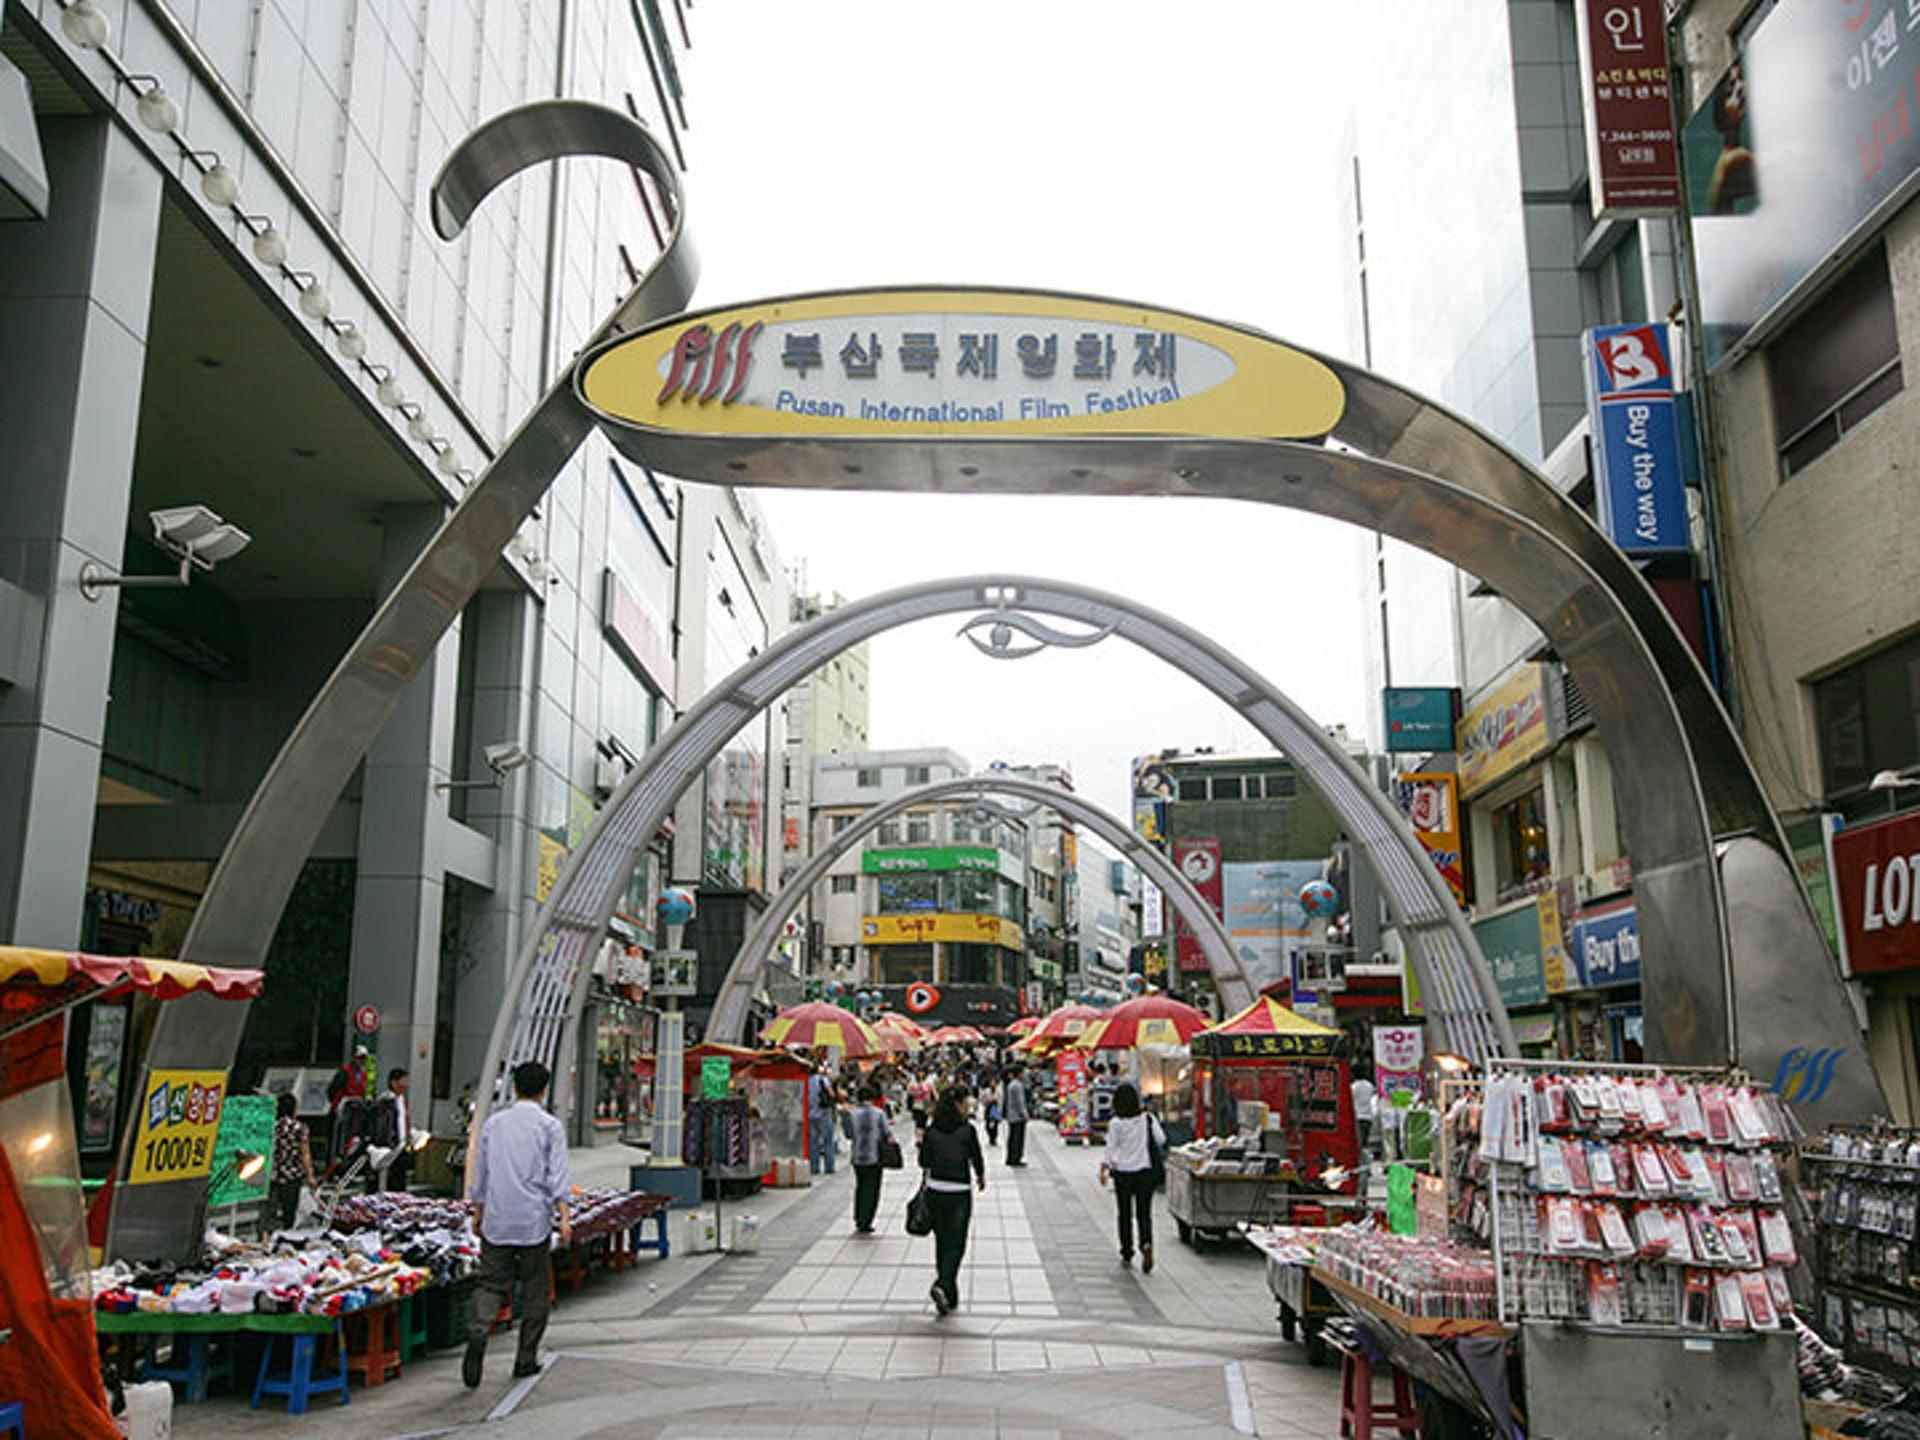 BIFF廣場——遠近聞名的甜餅攤!過去的電影節主會場(韓巢)